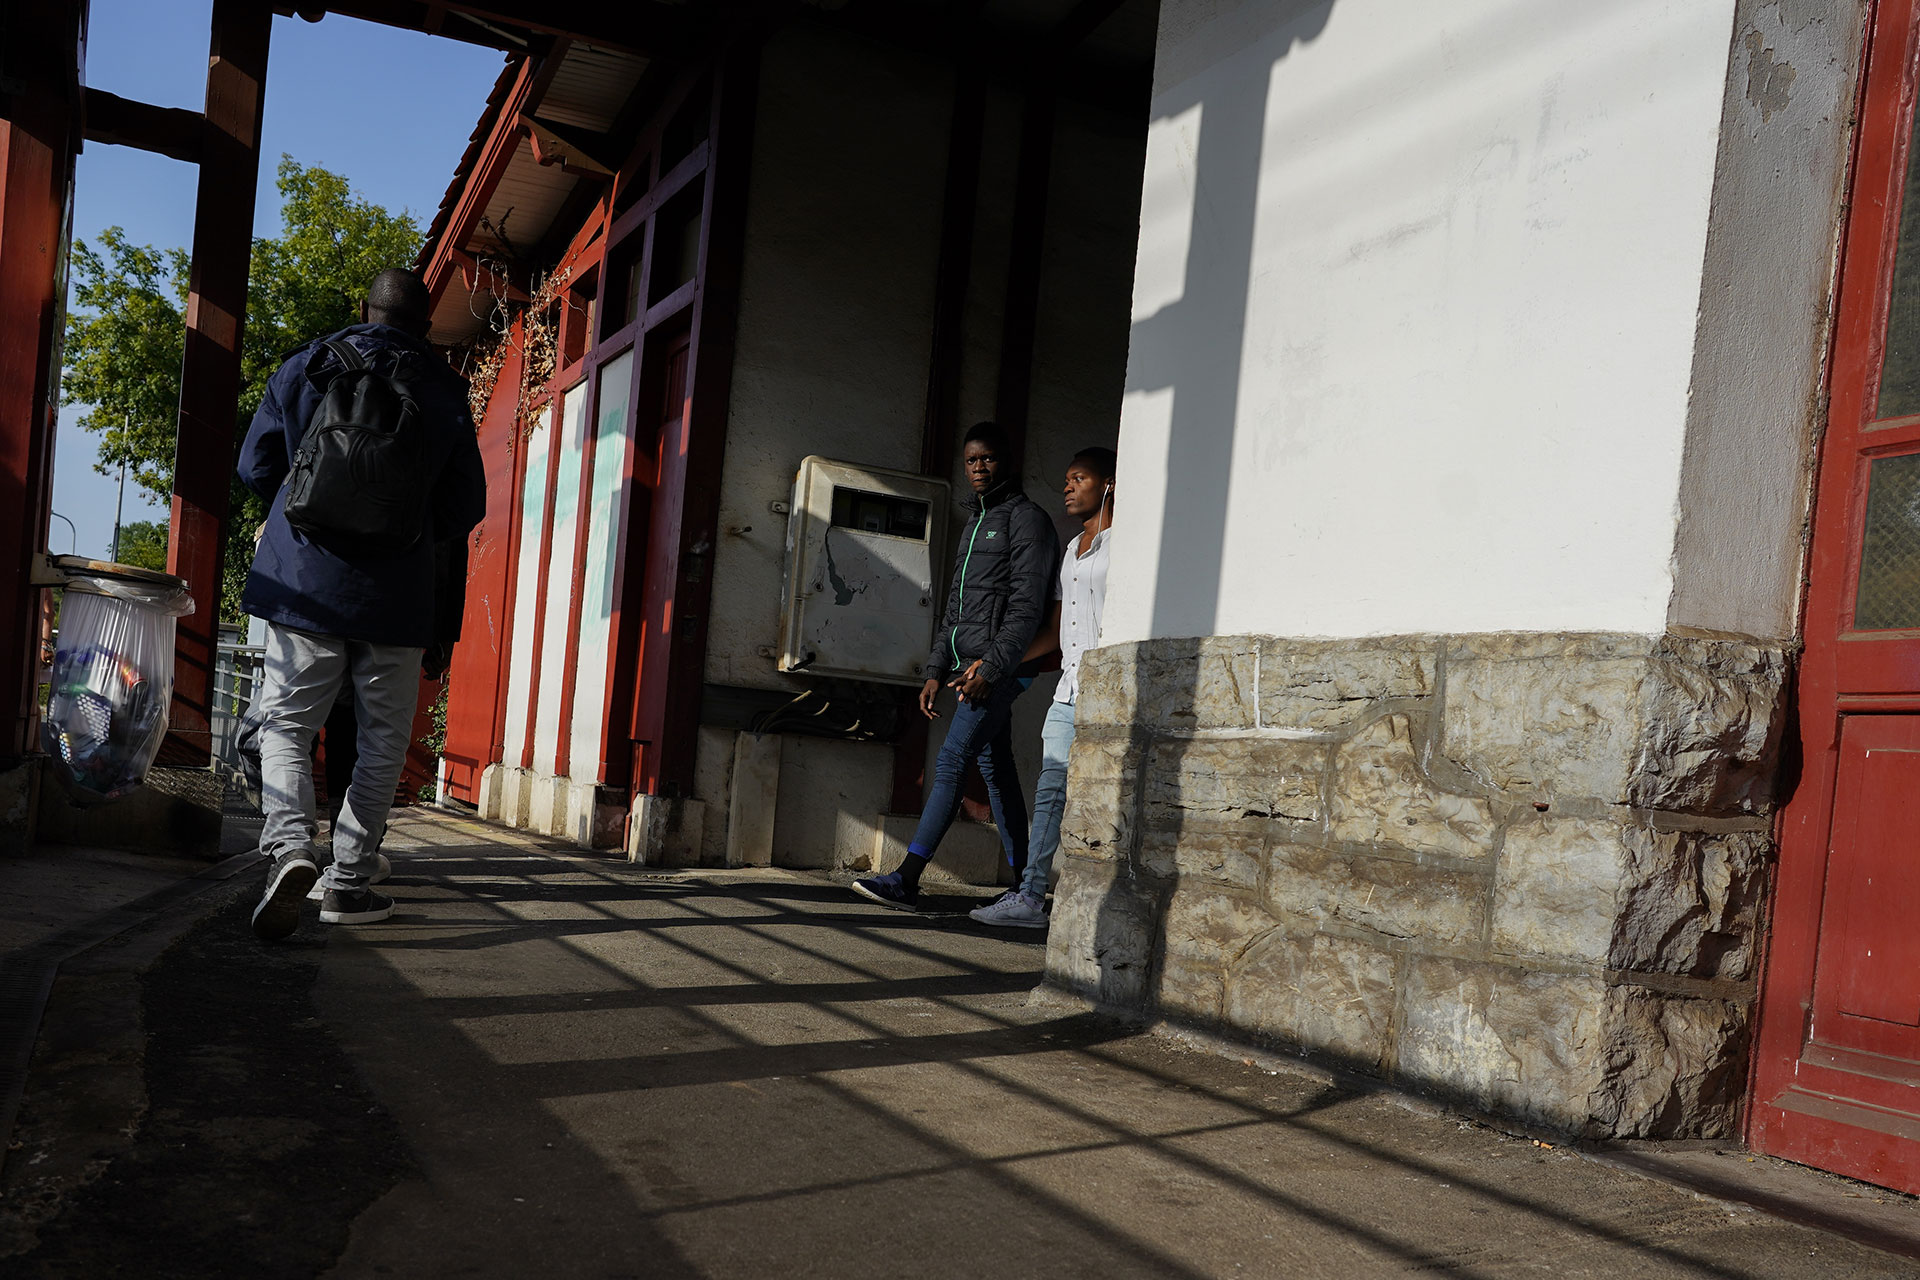 Ousmane llega a una estación de tren junto a tres compañeros antes de tomar un tren para intentar llegar a Bayona, 17 de Septiembre de 2019.